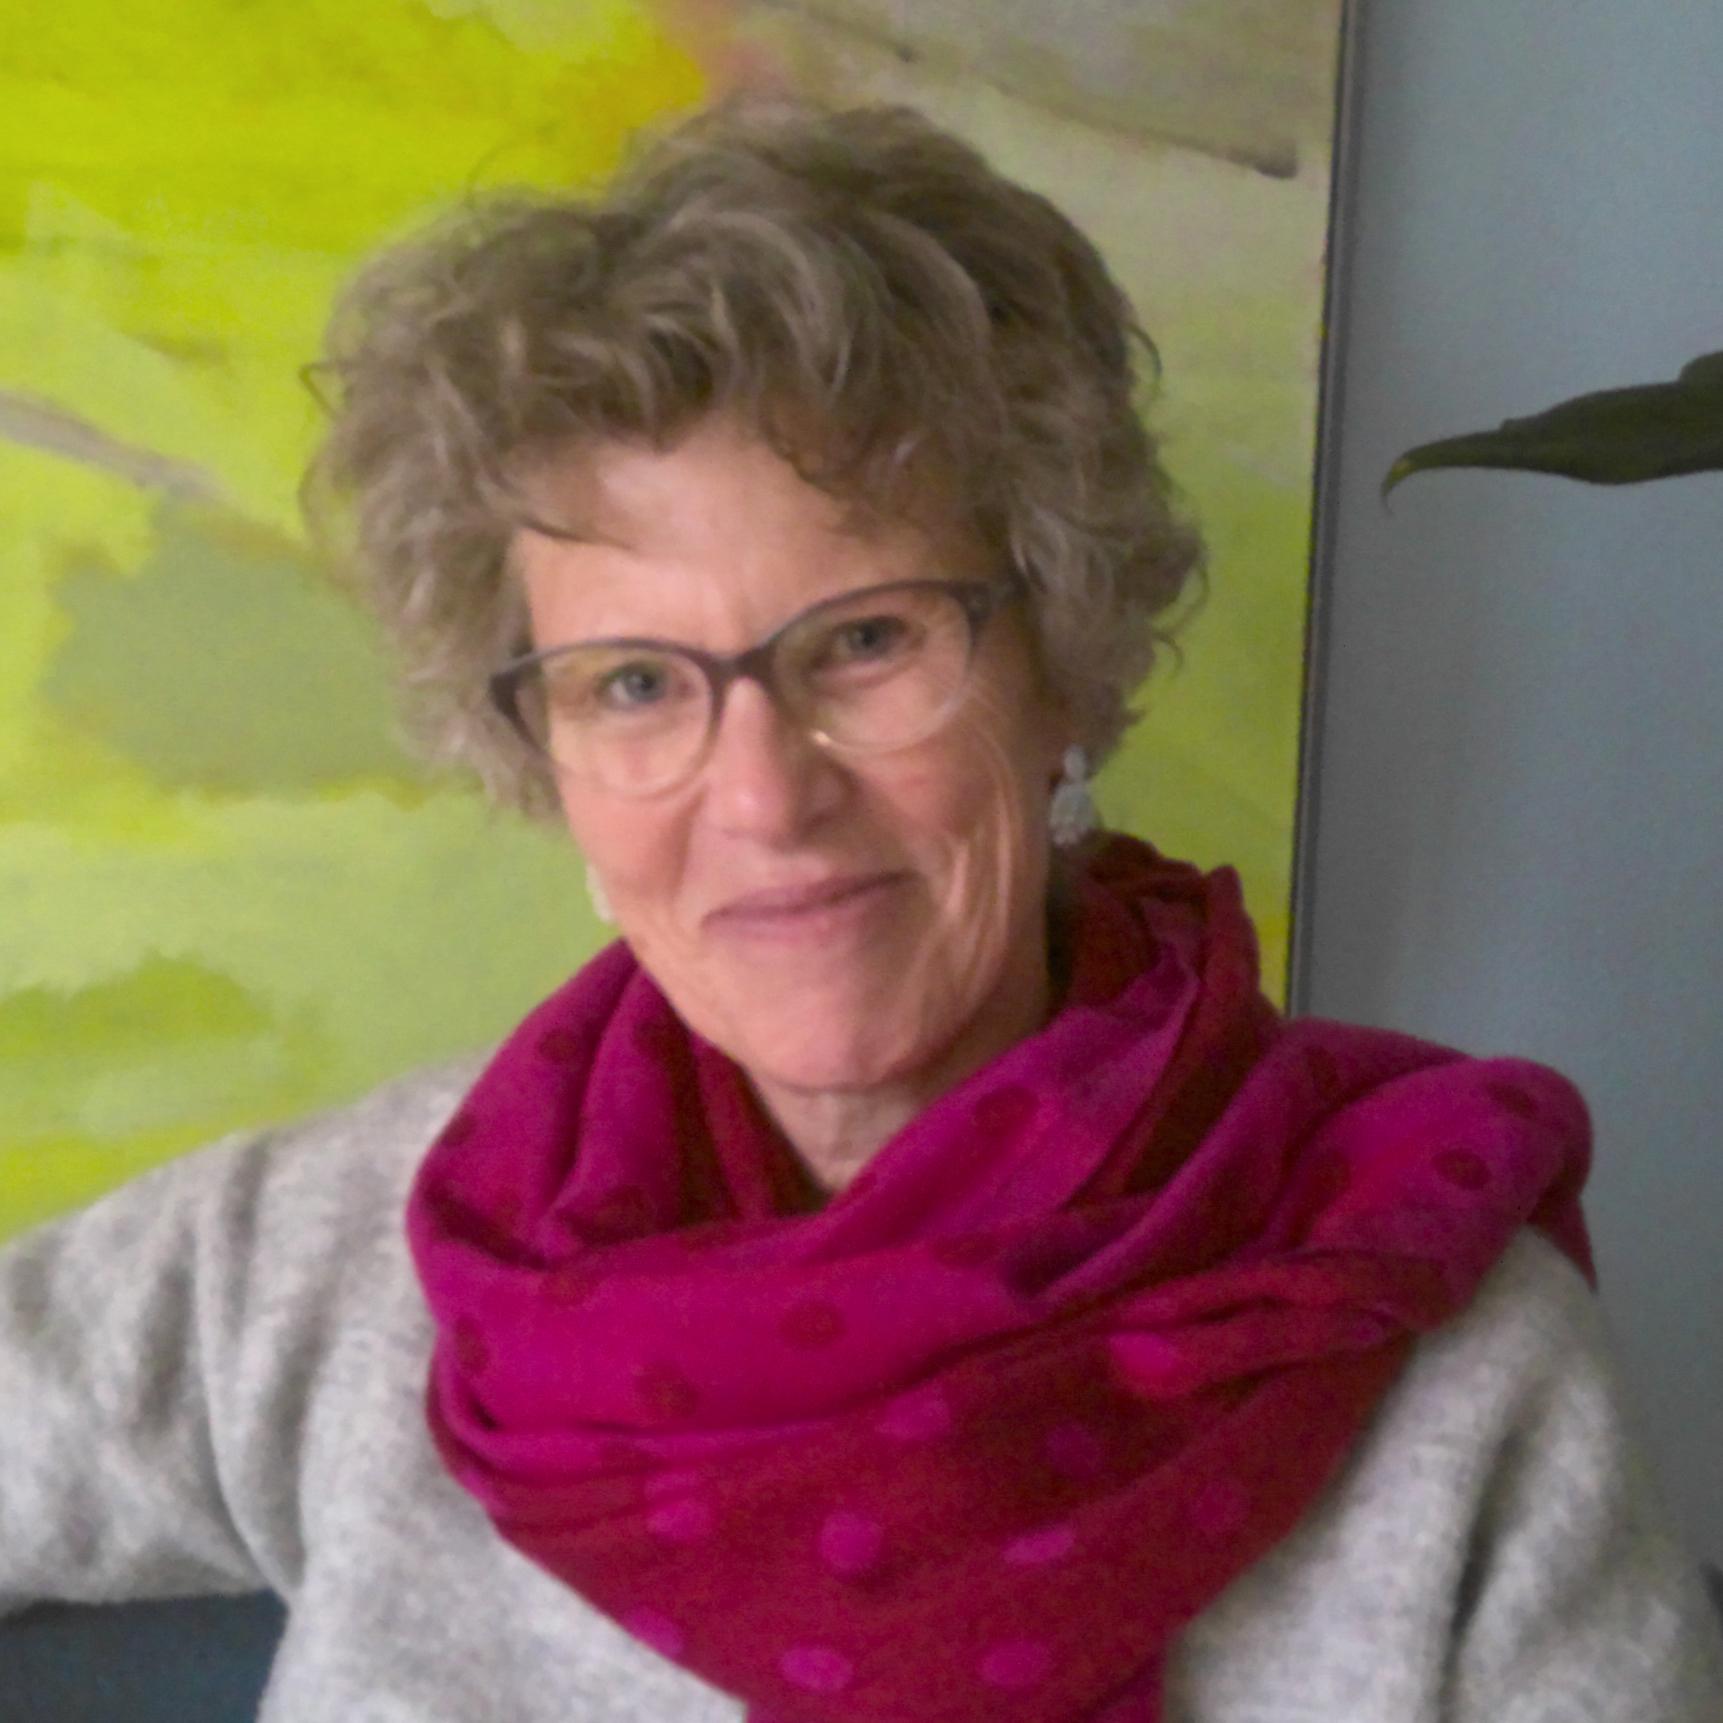 Mieke Cardol